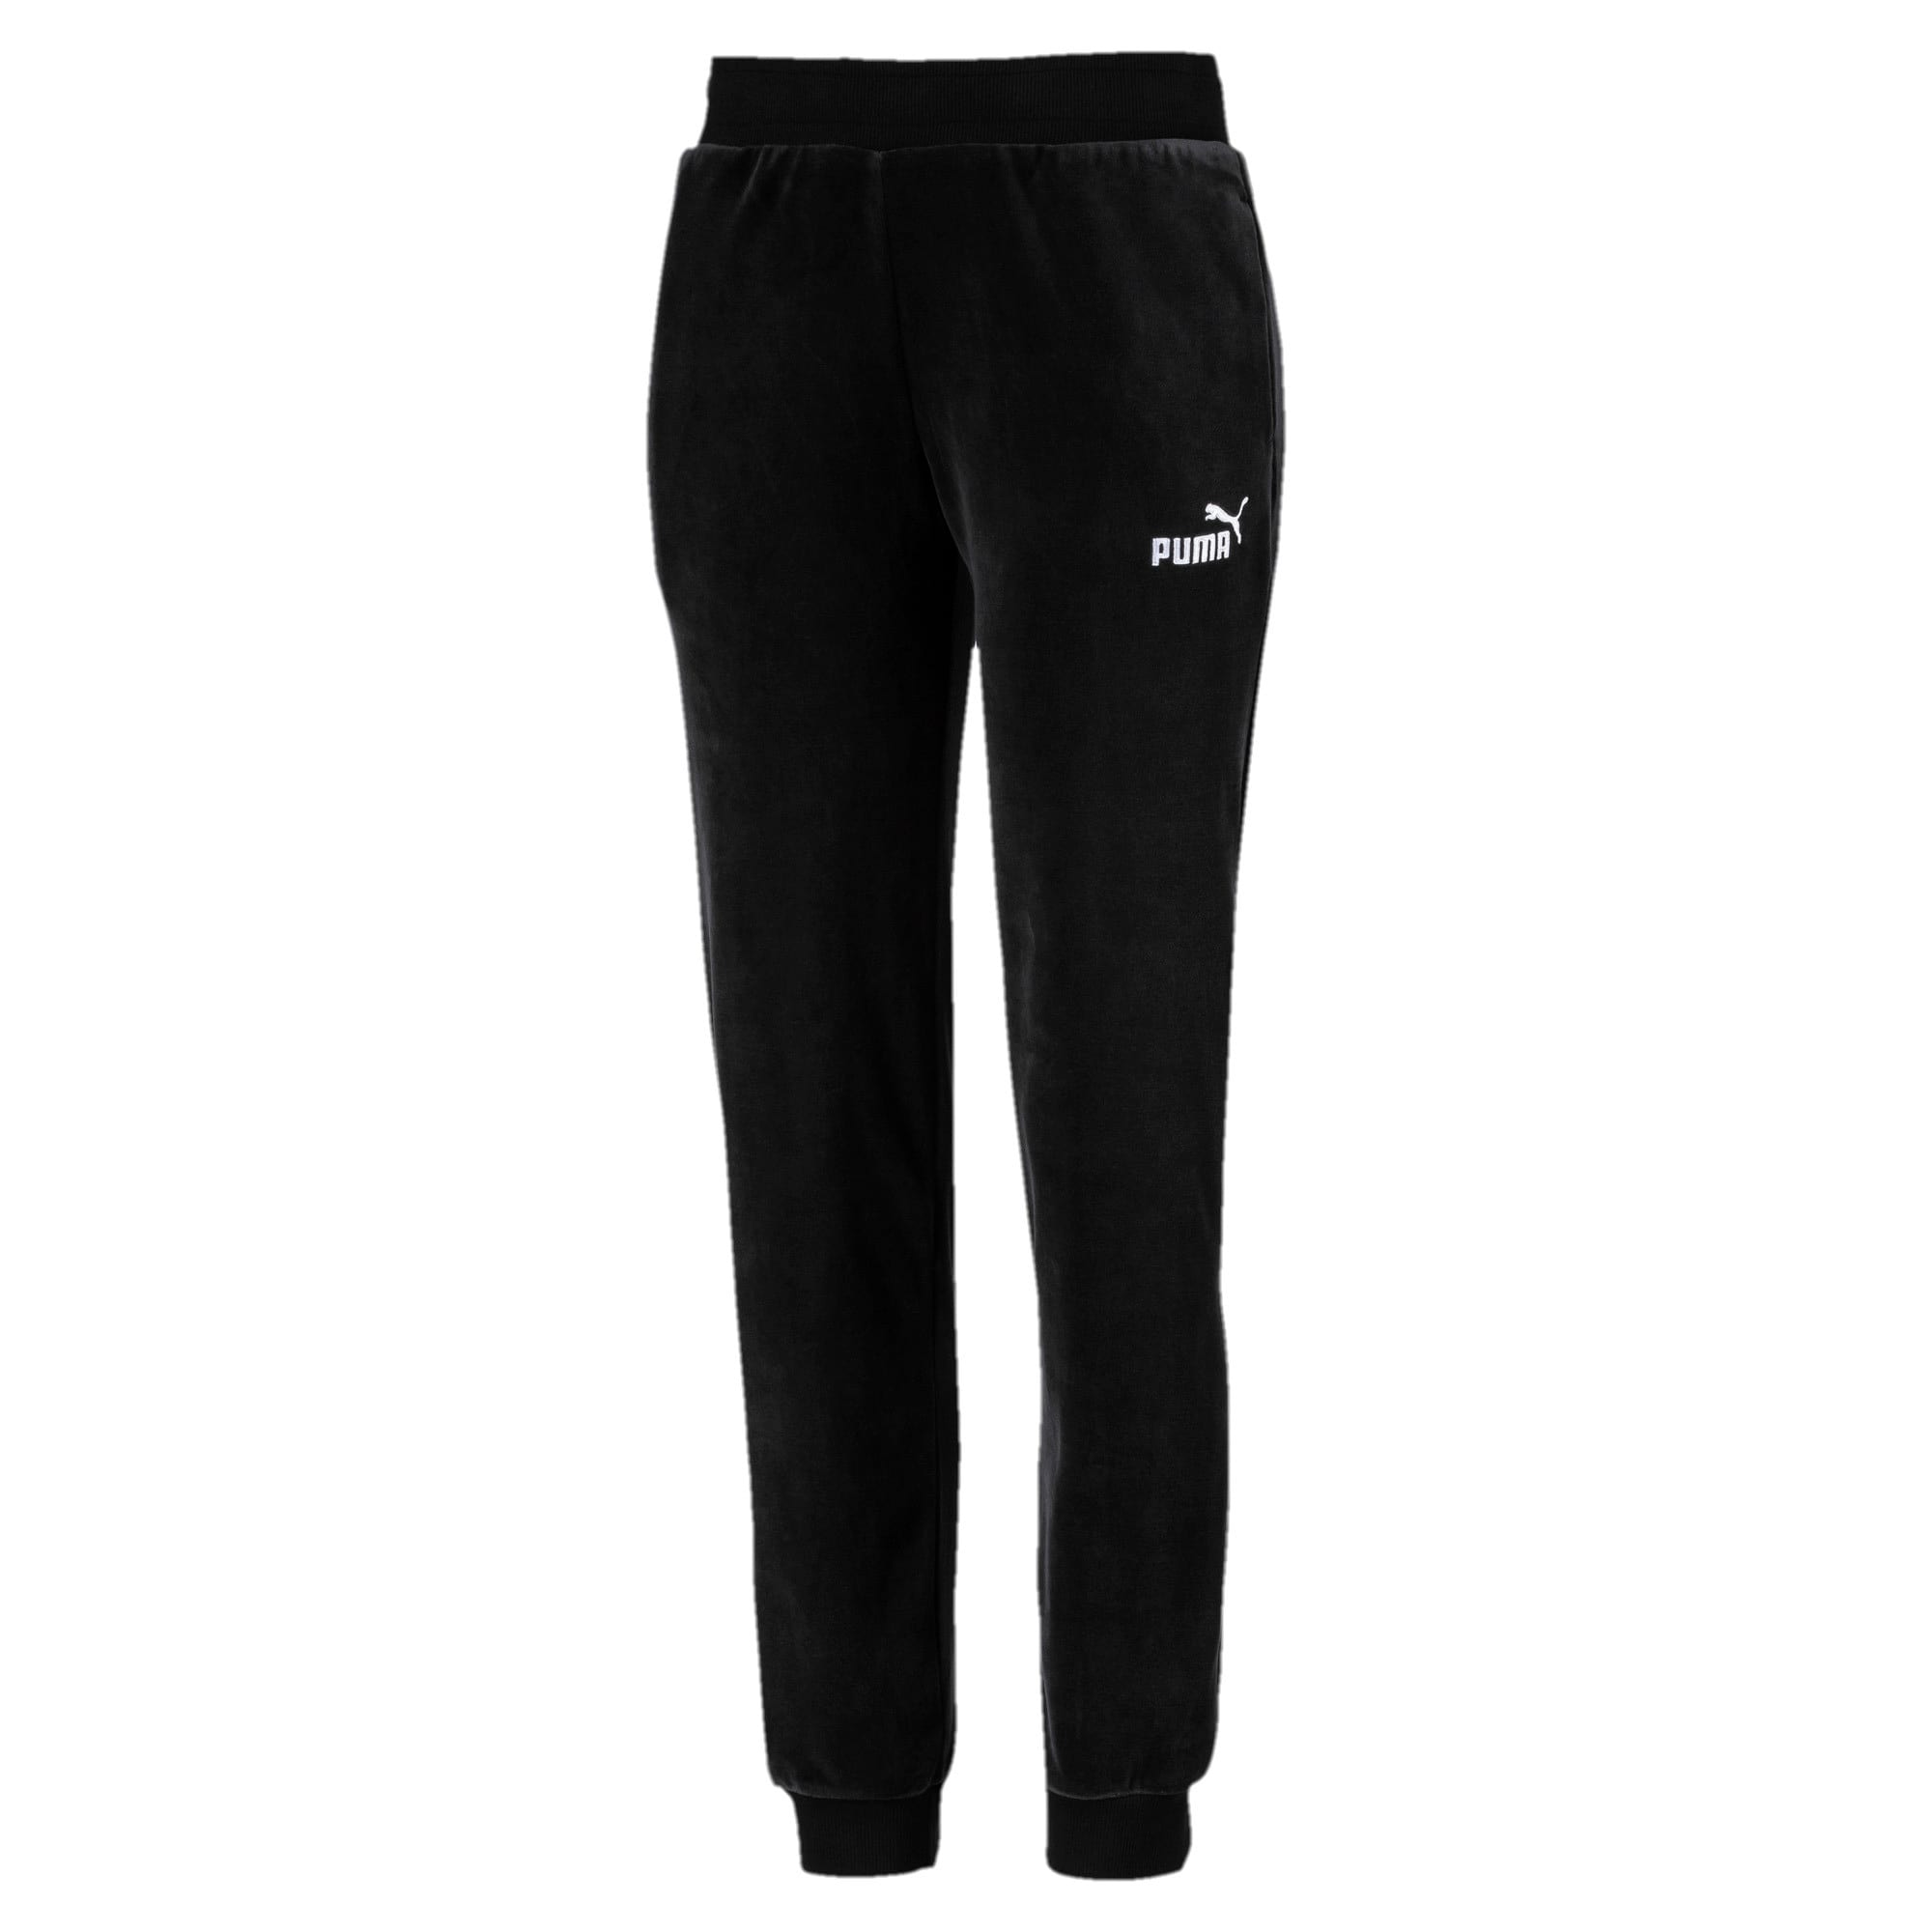 Thumbnail 1 of Essential Damen Velours Sweatpants, Cotton Black, medium